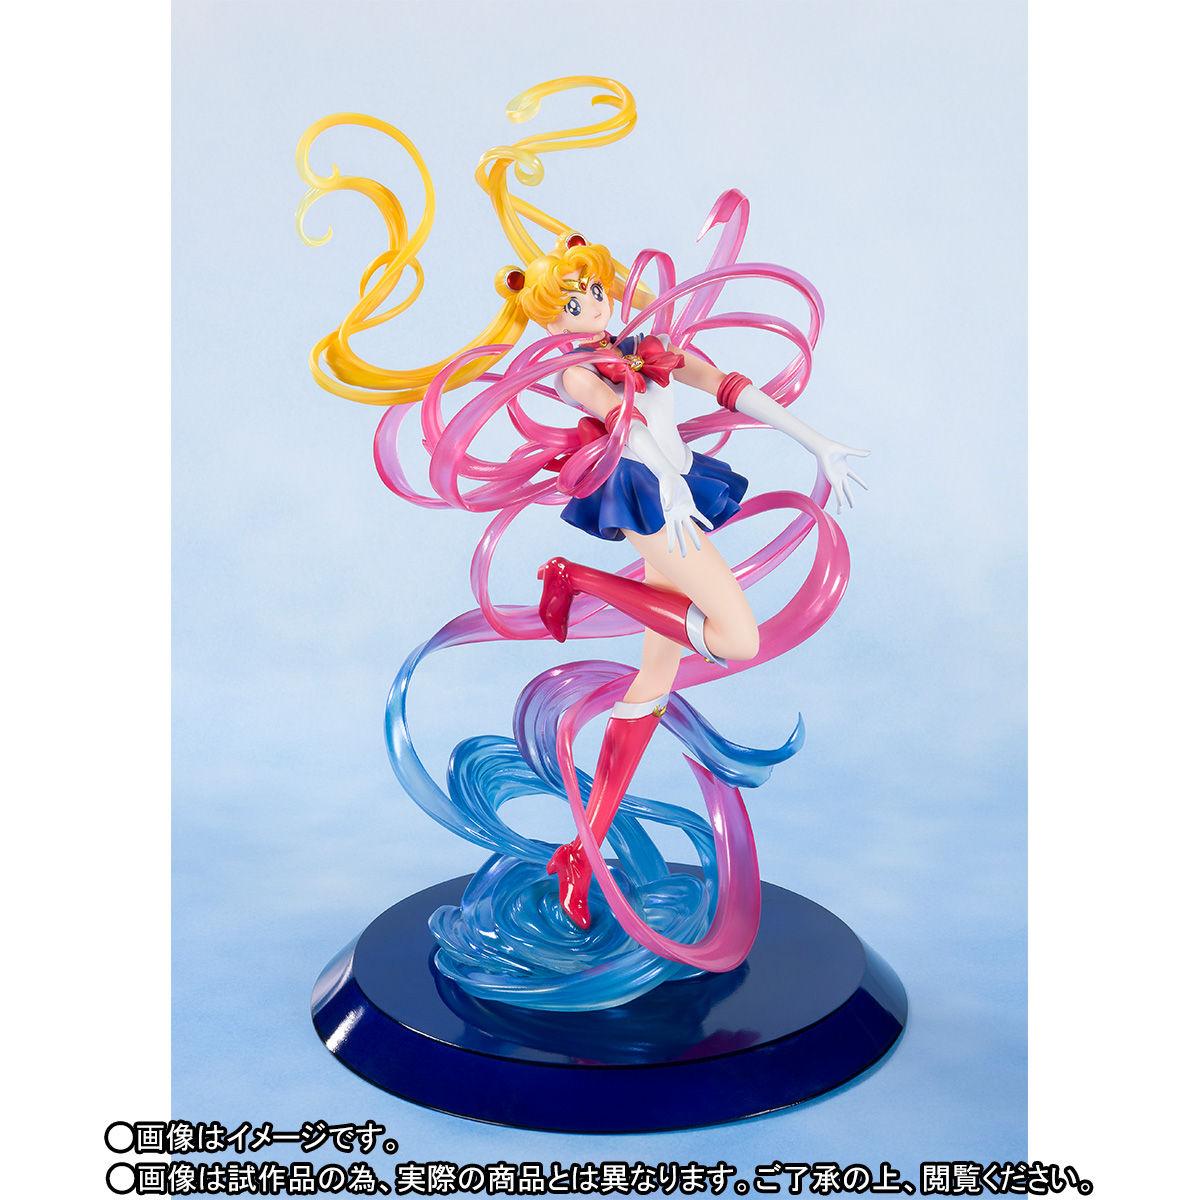 Figuarts Zero chouette『セーラームーン -Moon Crystal Power, Make Up-』完成品フィギュア-003